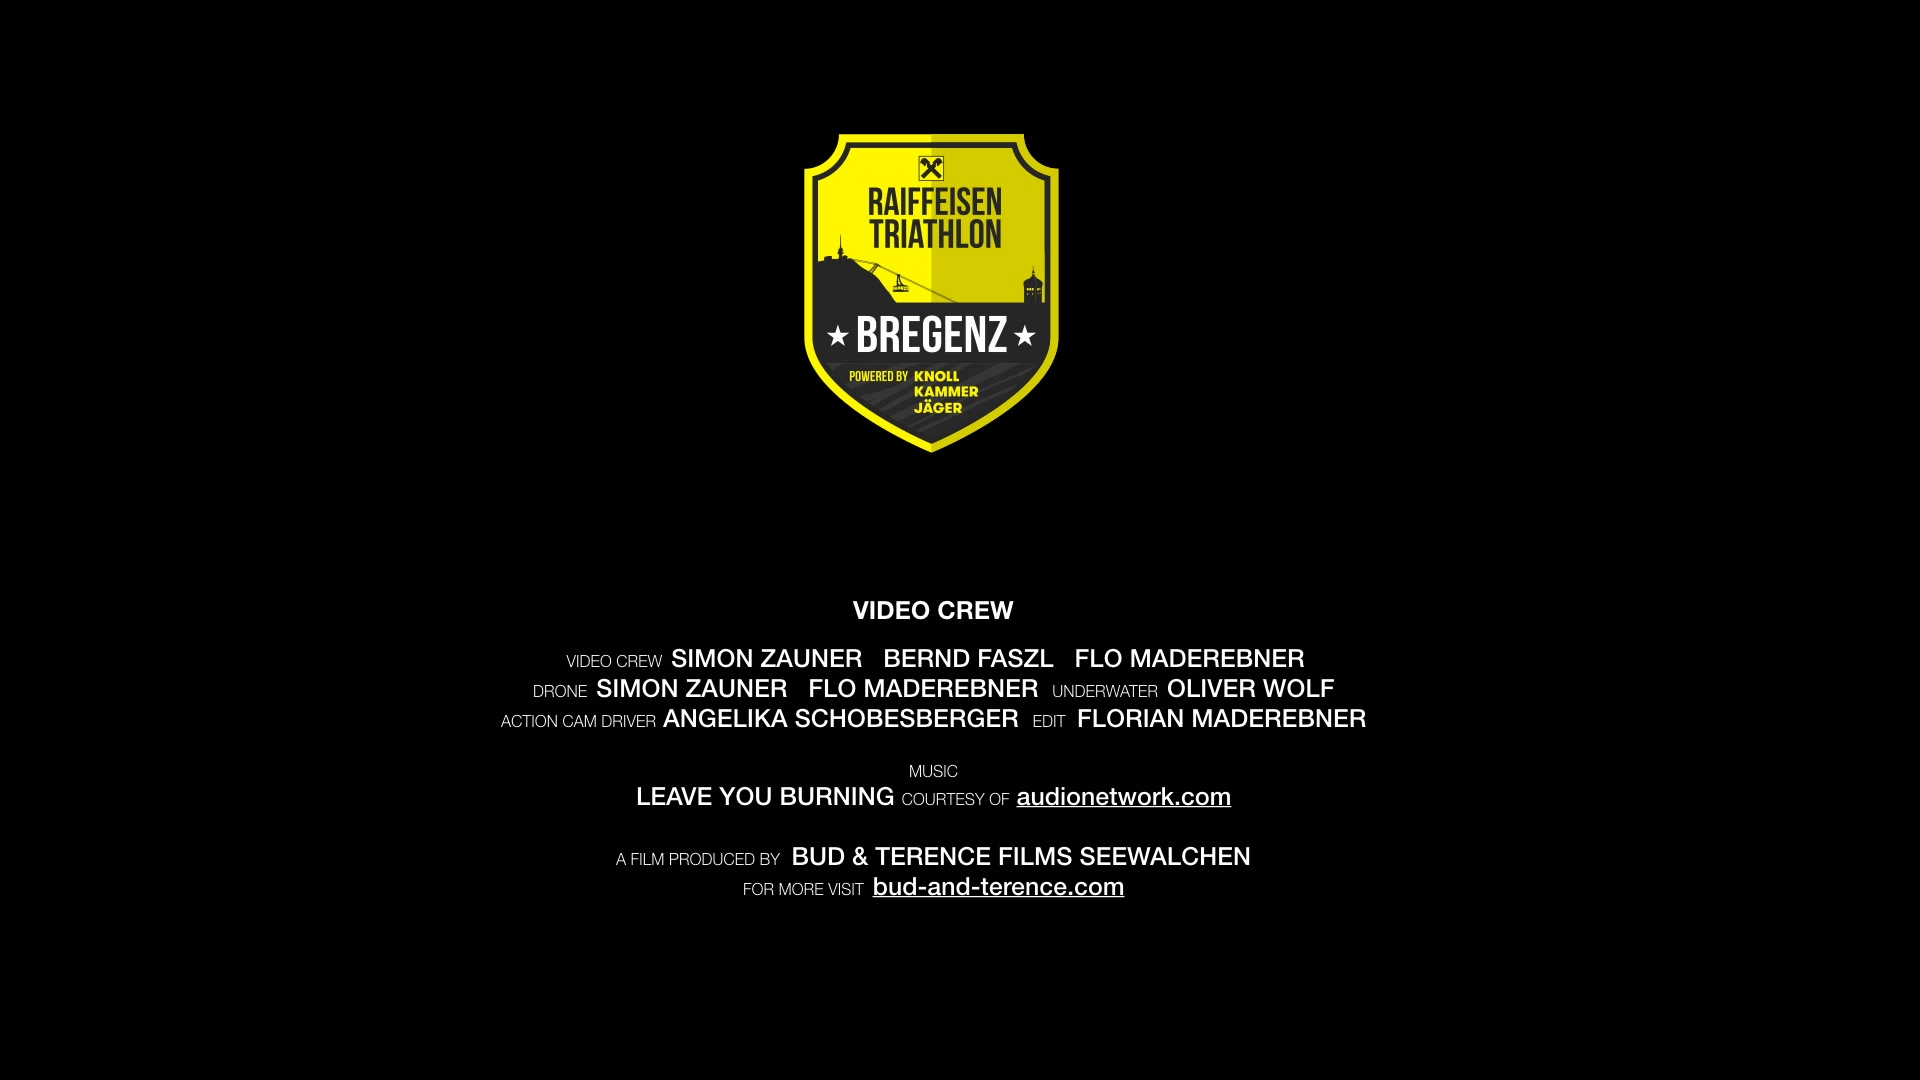 Triathlon Bregenz 2018 Film Team Crew